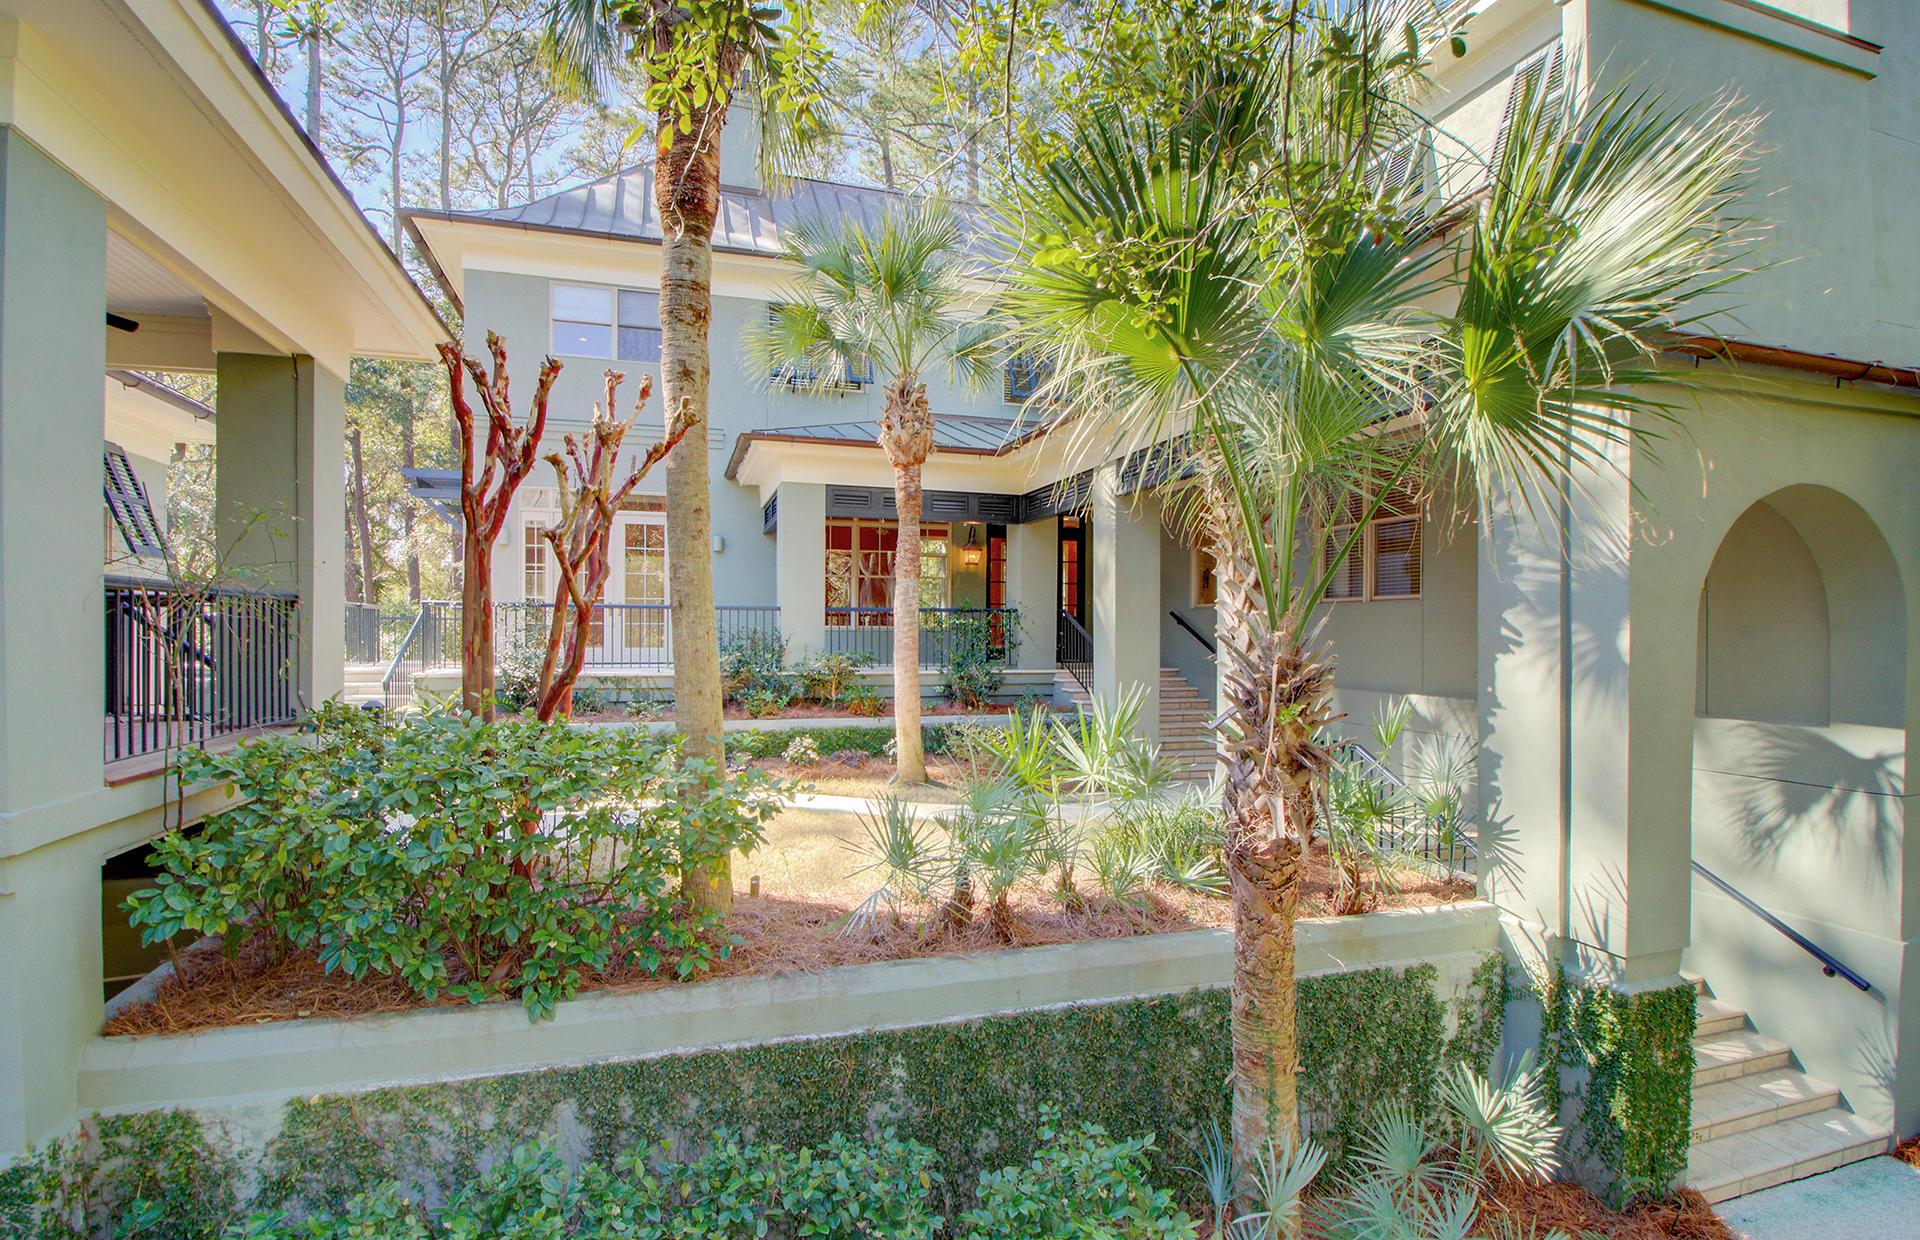 Kiawah Island Homes For Sale - 402 Ocean Oaks, Kiawah Island, SC - 16